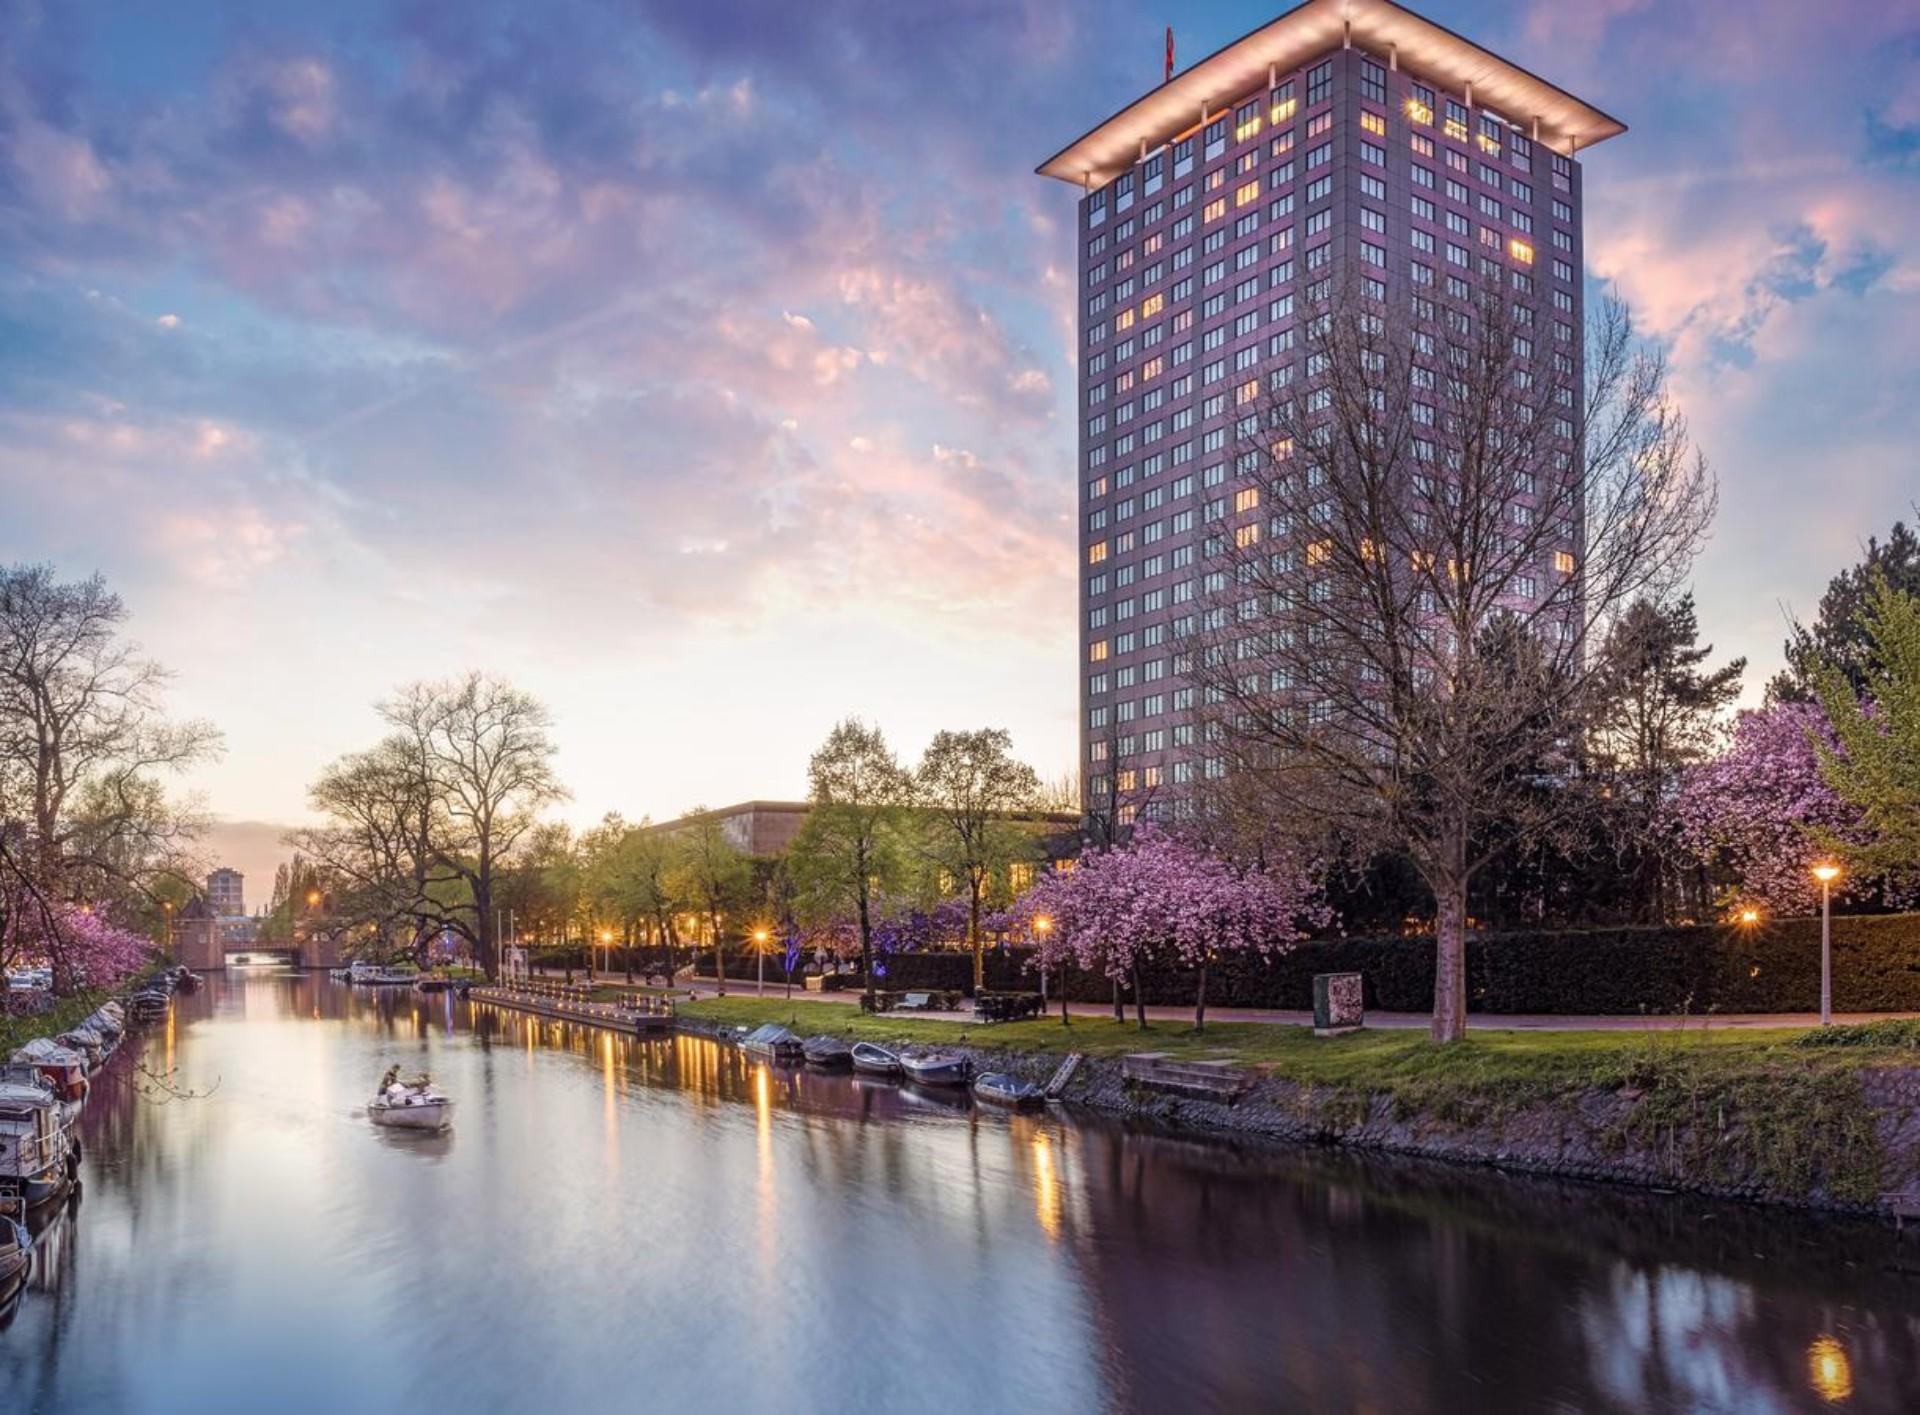 Hotel Okura Amsterdam appoints Michiel Roelfsema as new general manager